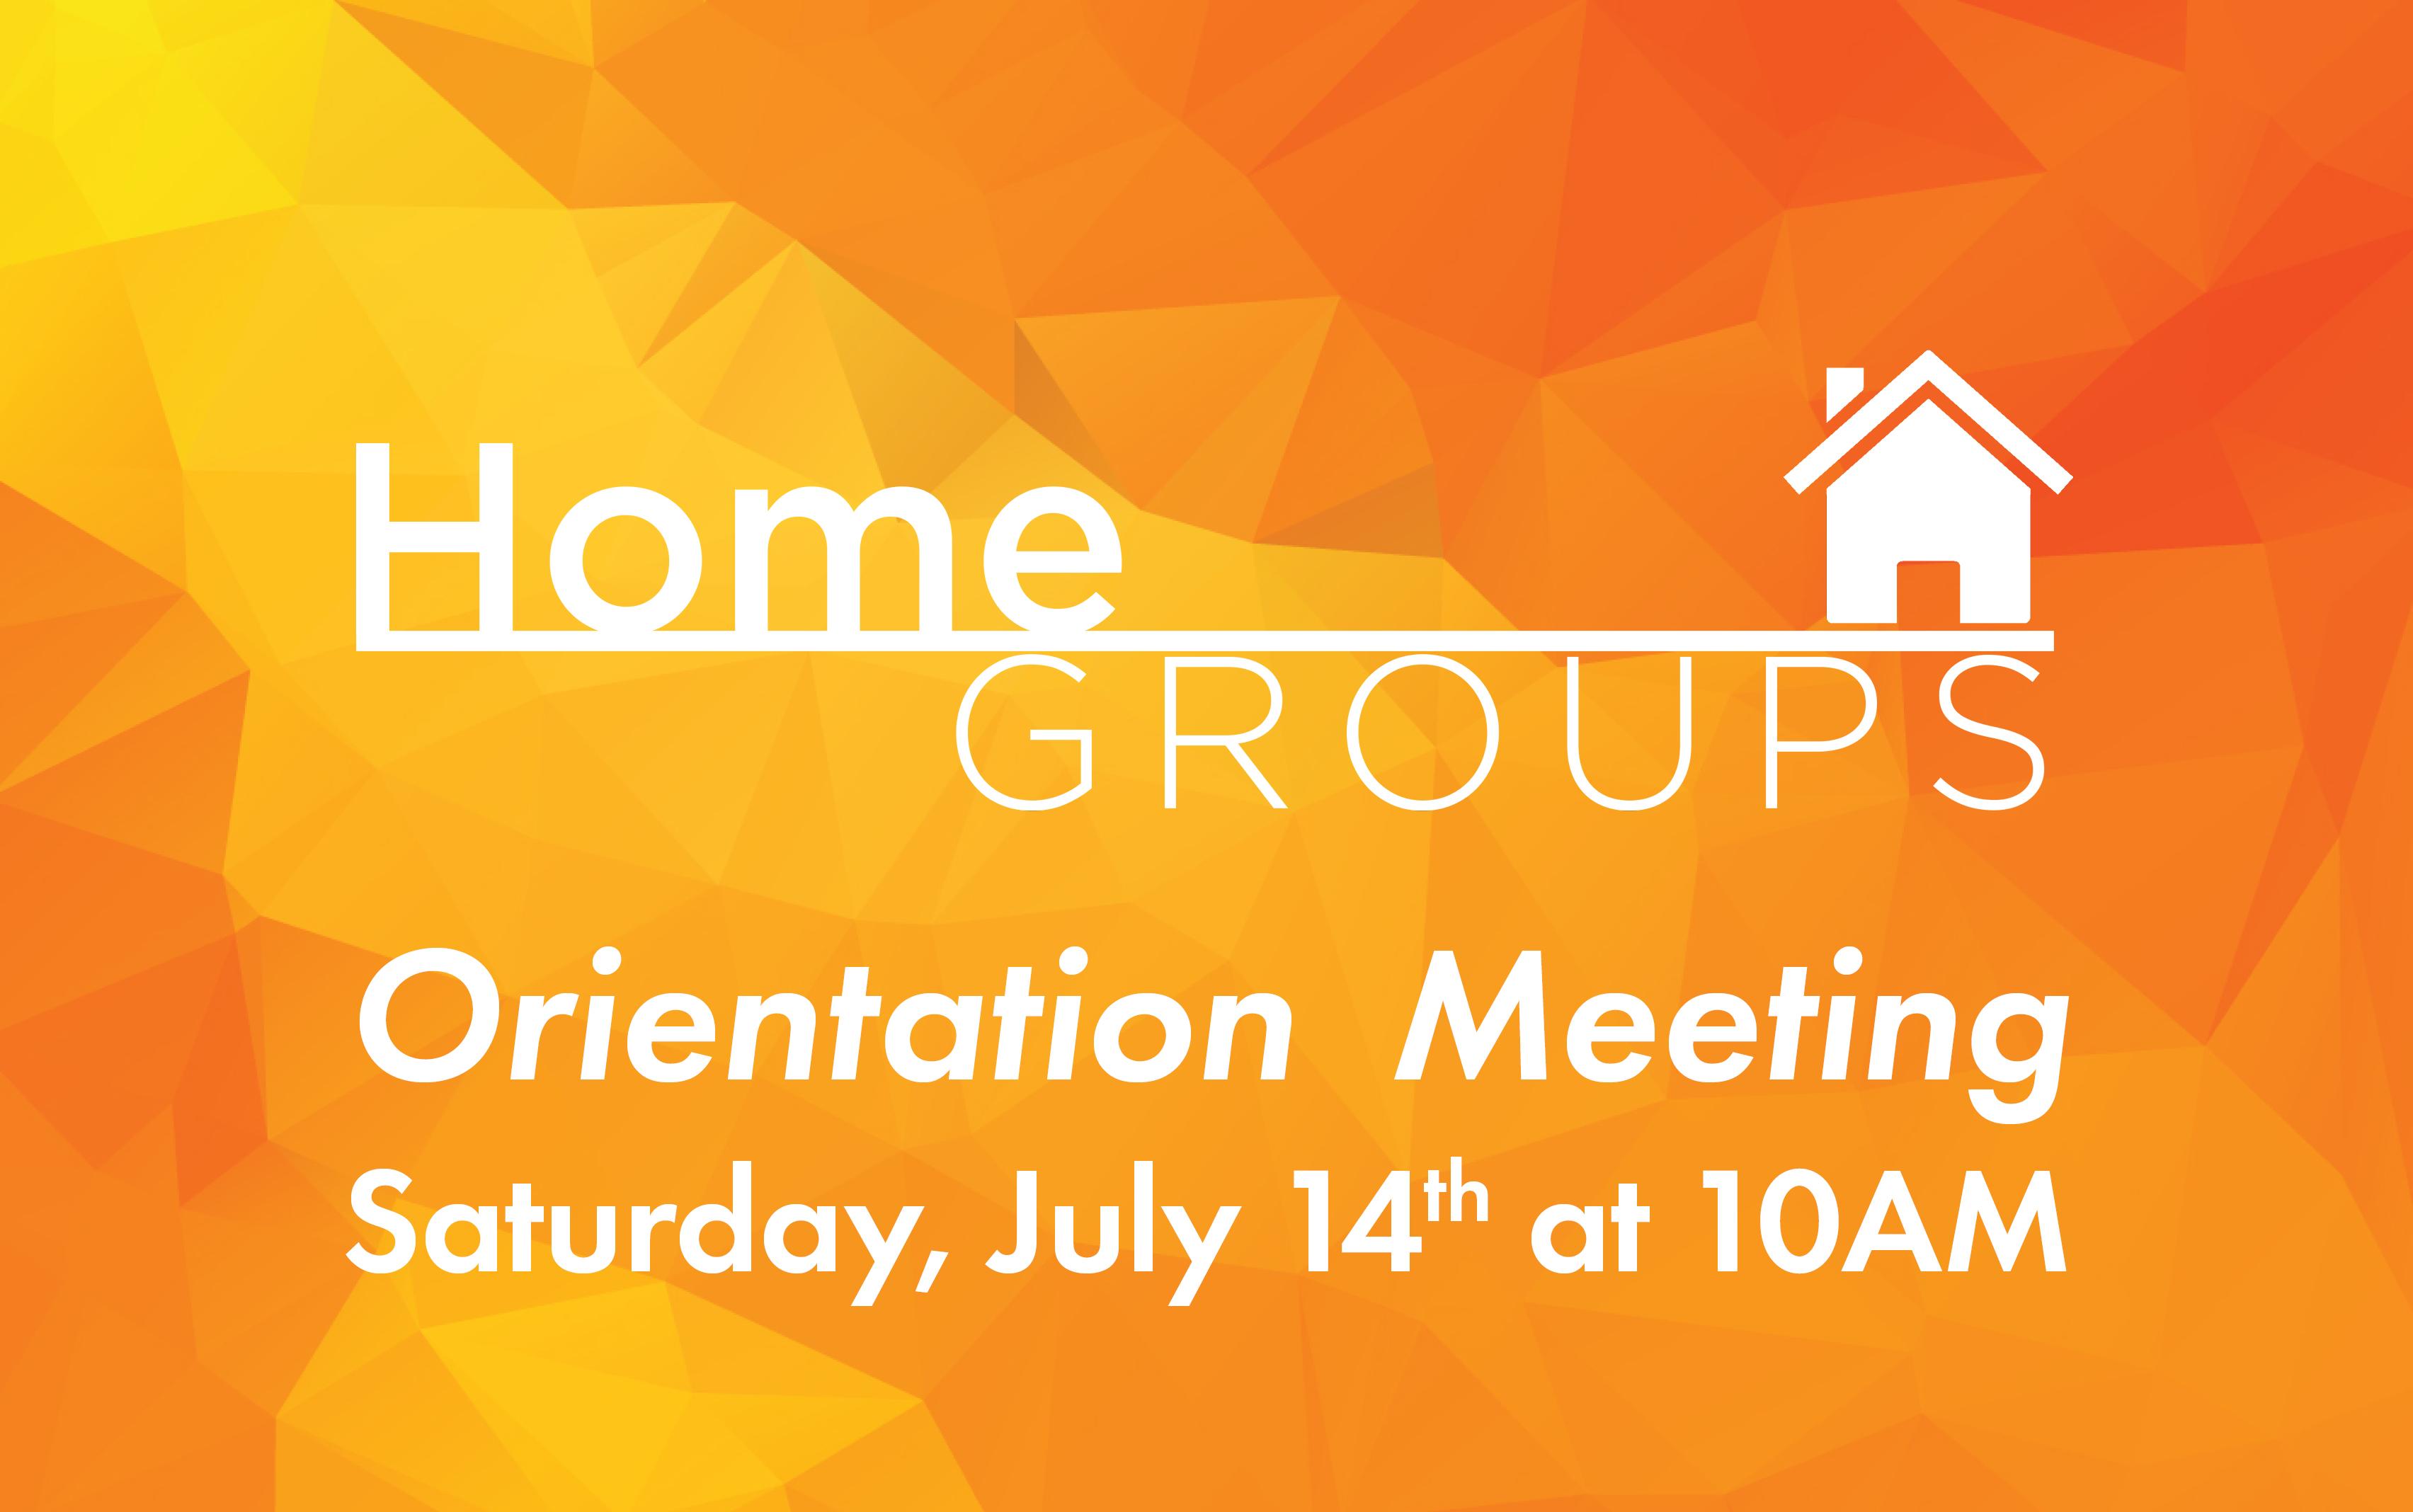 Home group meeting 2018 07 14 screen